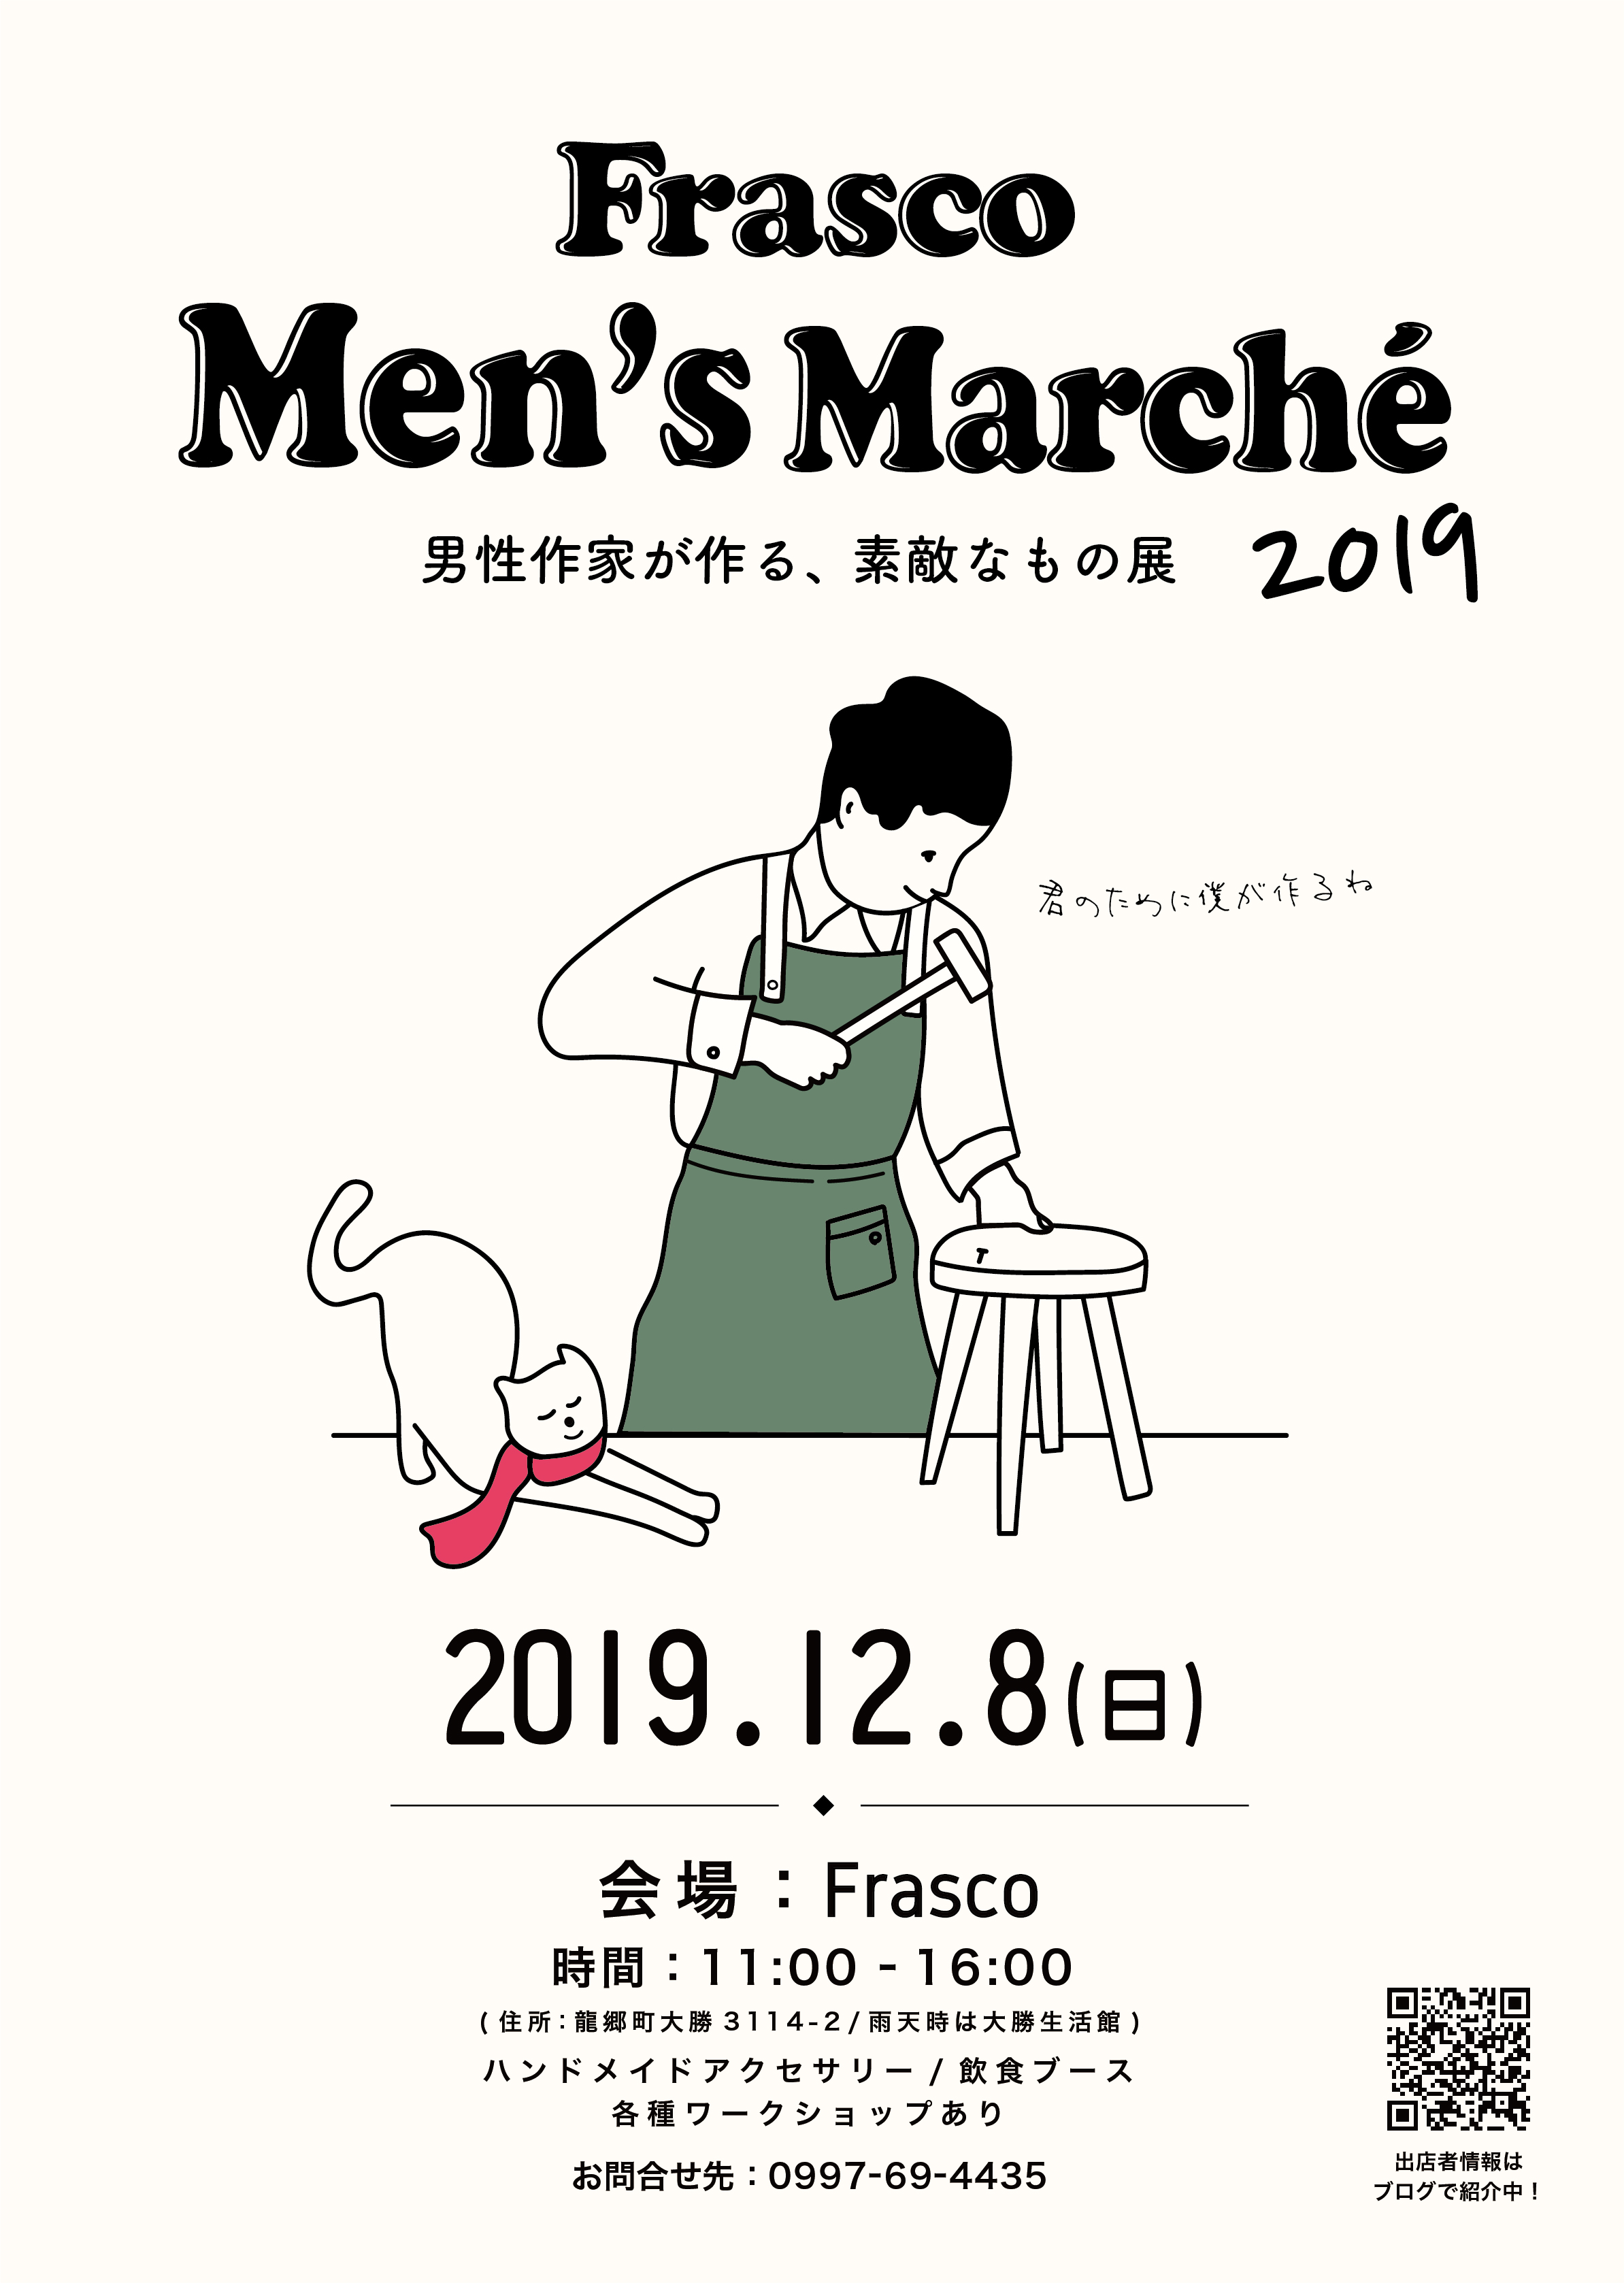 Frasco de Marché 開催のお知らせ